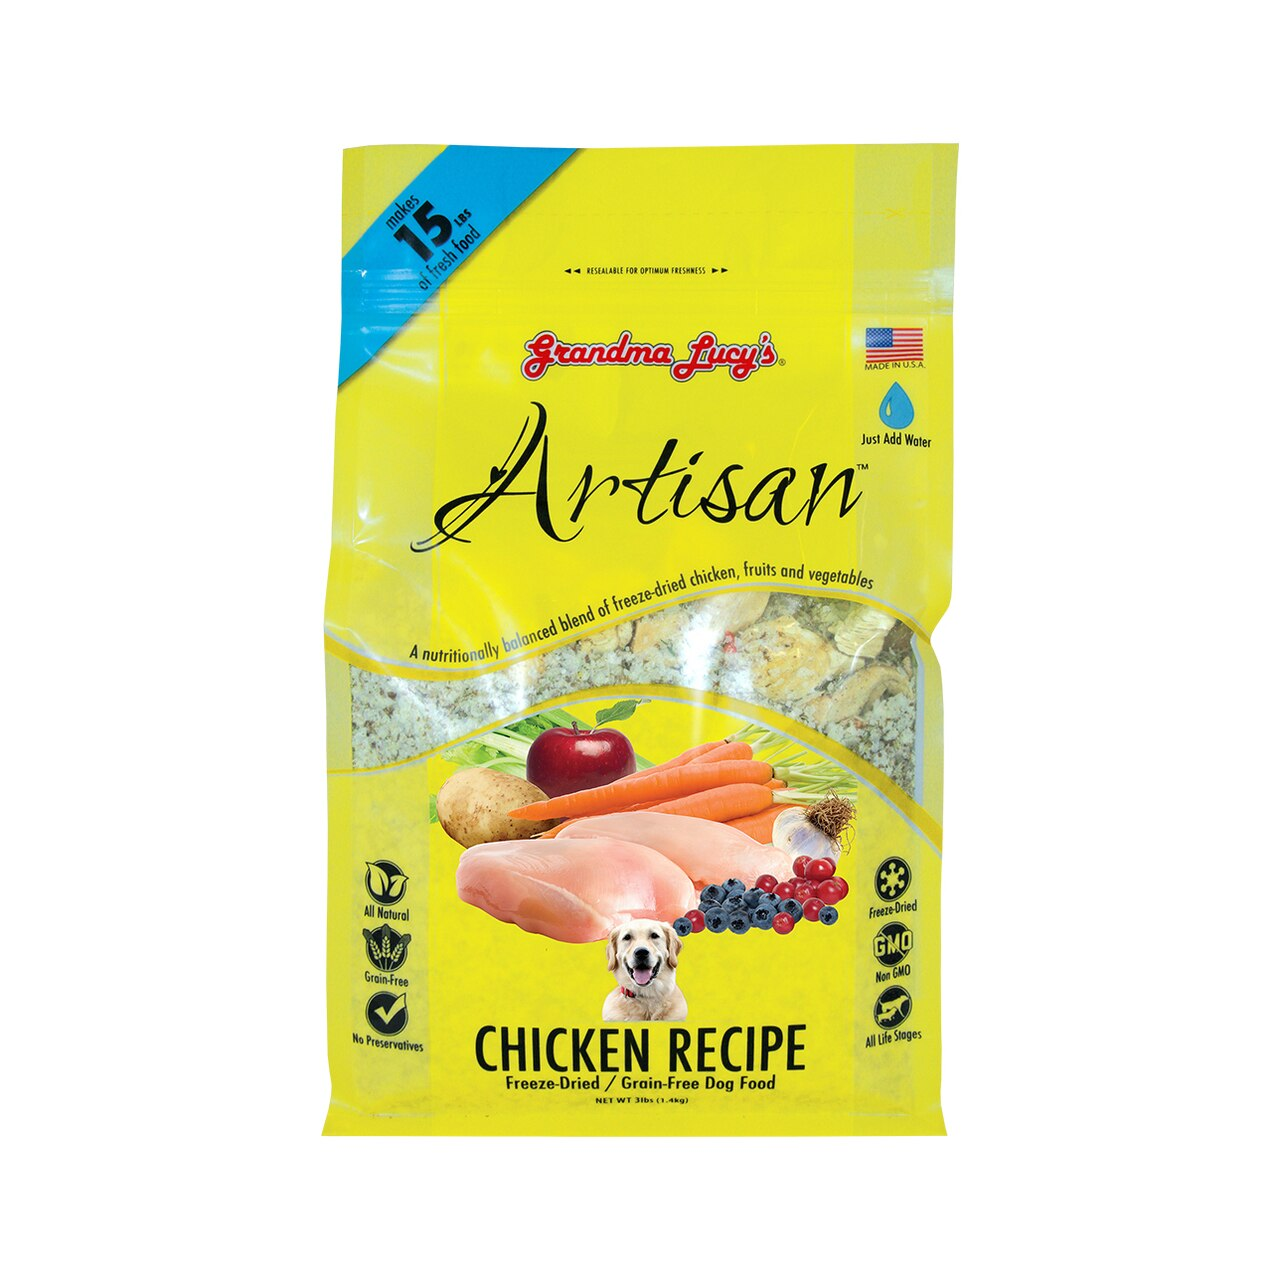 Grandma Lucy's Artisan Grain-Free Chicken Freeze-Dried Dog Food